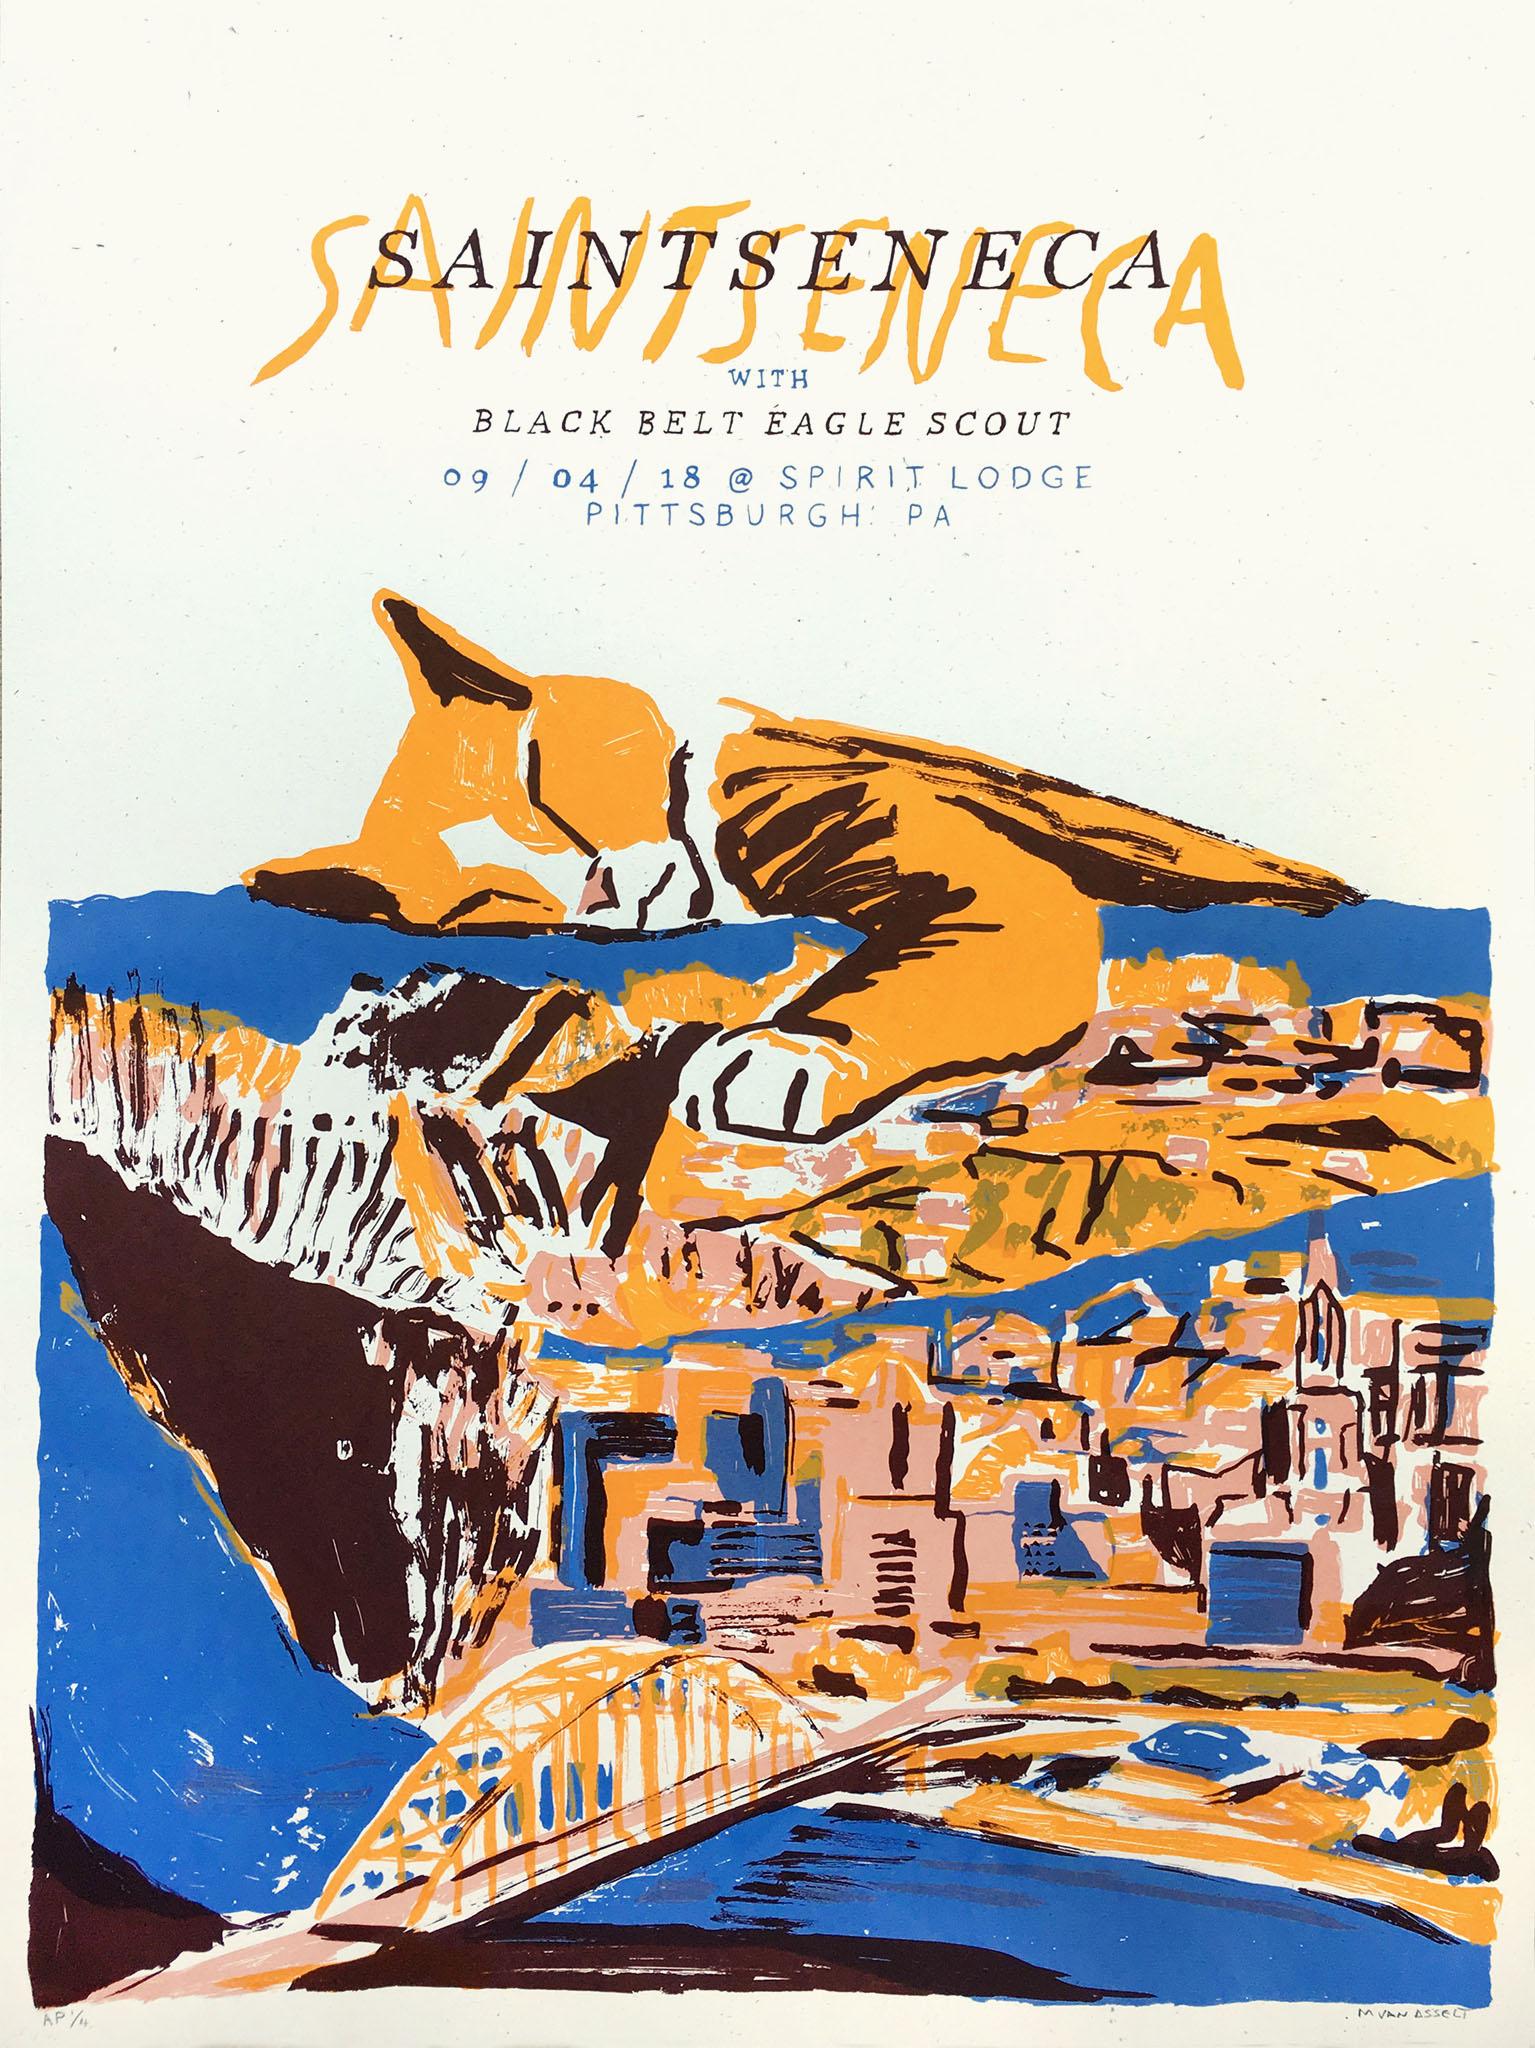 Saintseneca Poster